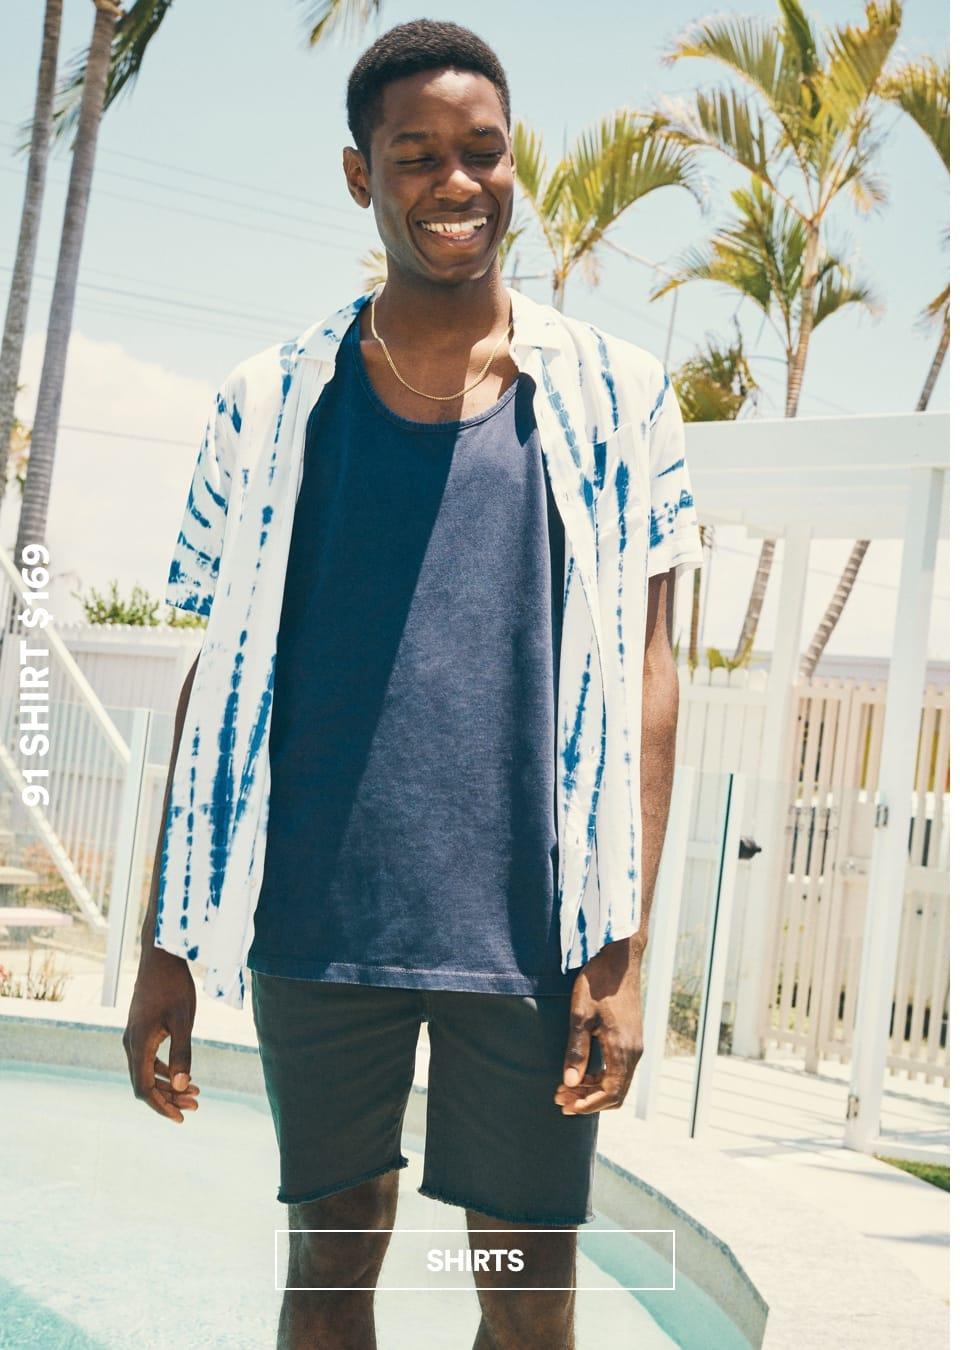 Cotton On Men's Shirts. Click to shop.